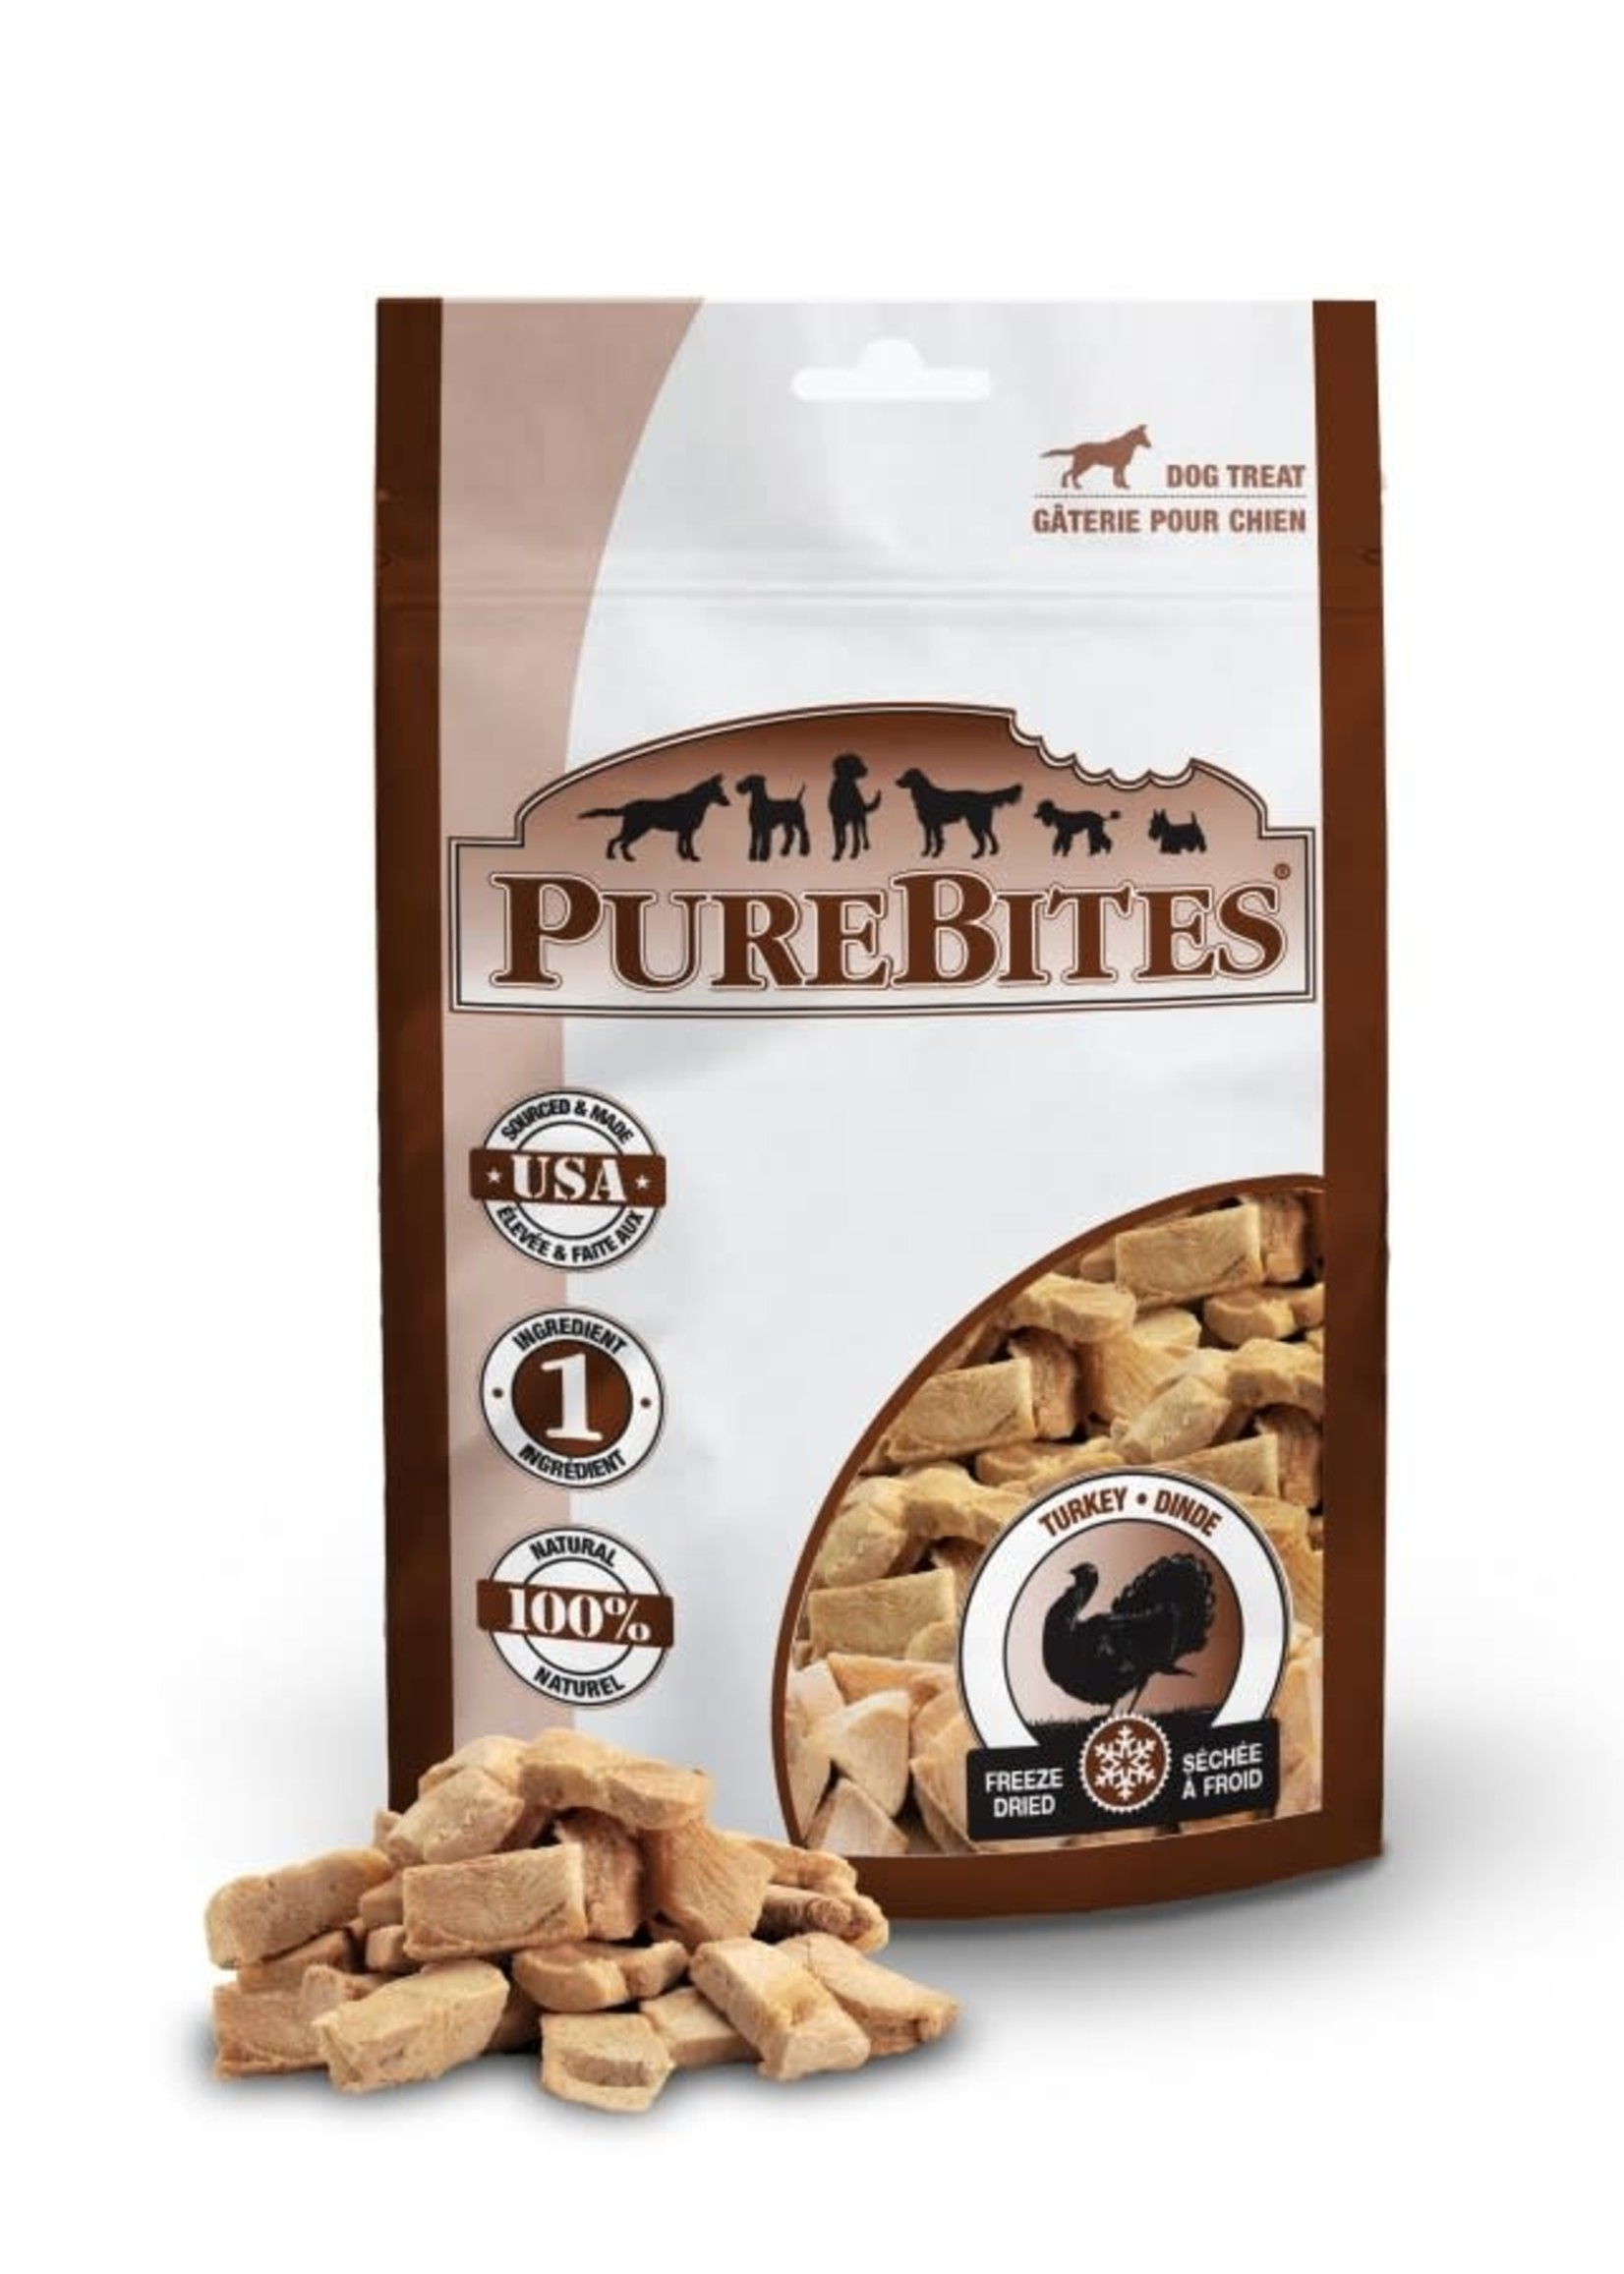 PUREBITES PureBites Turkey Mid 74g